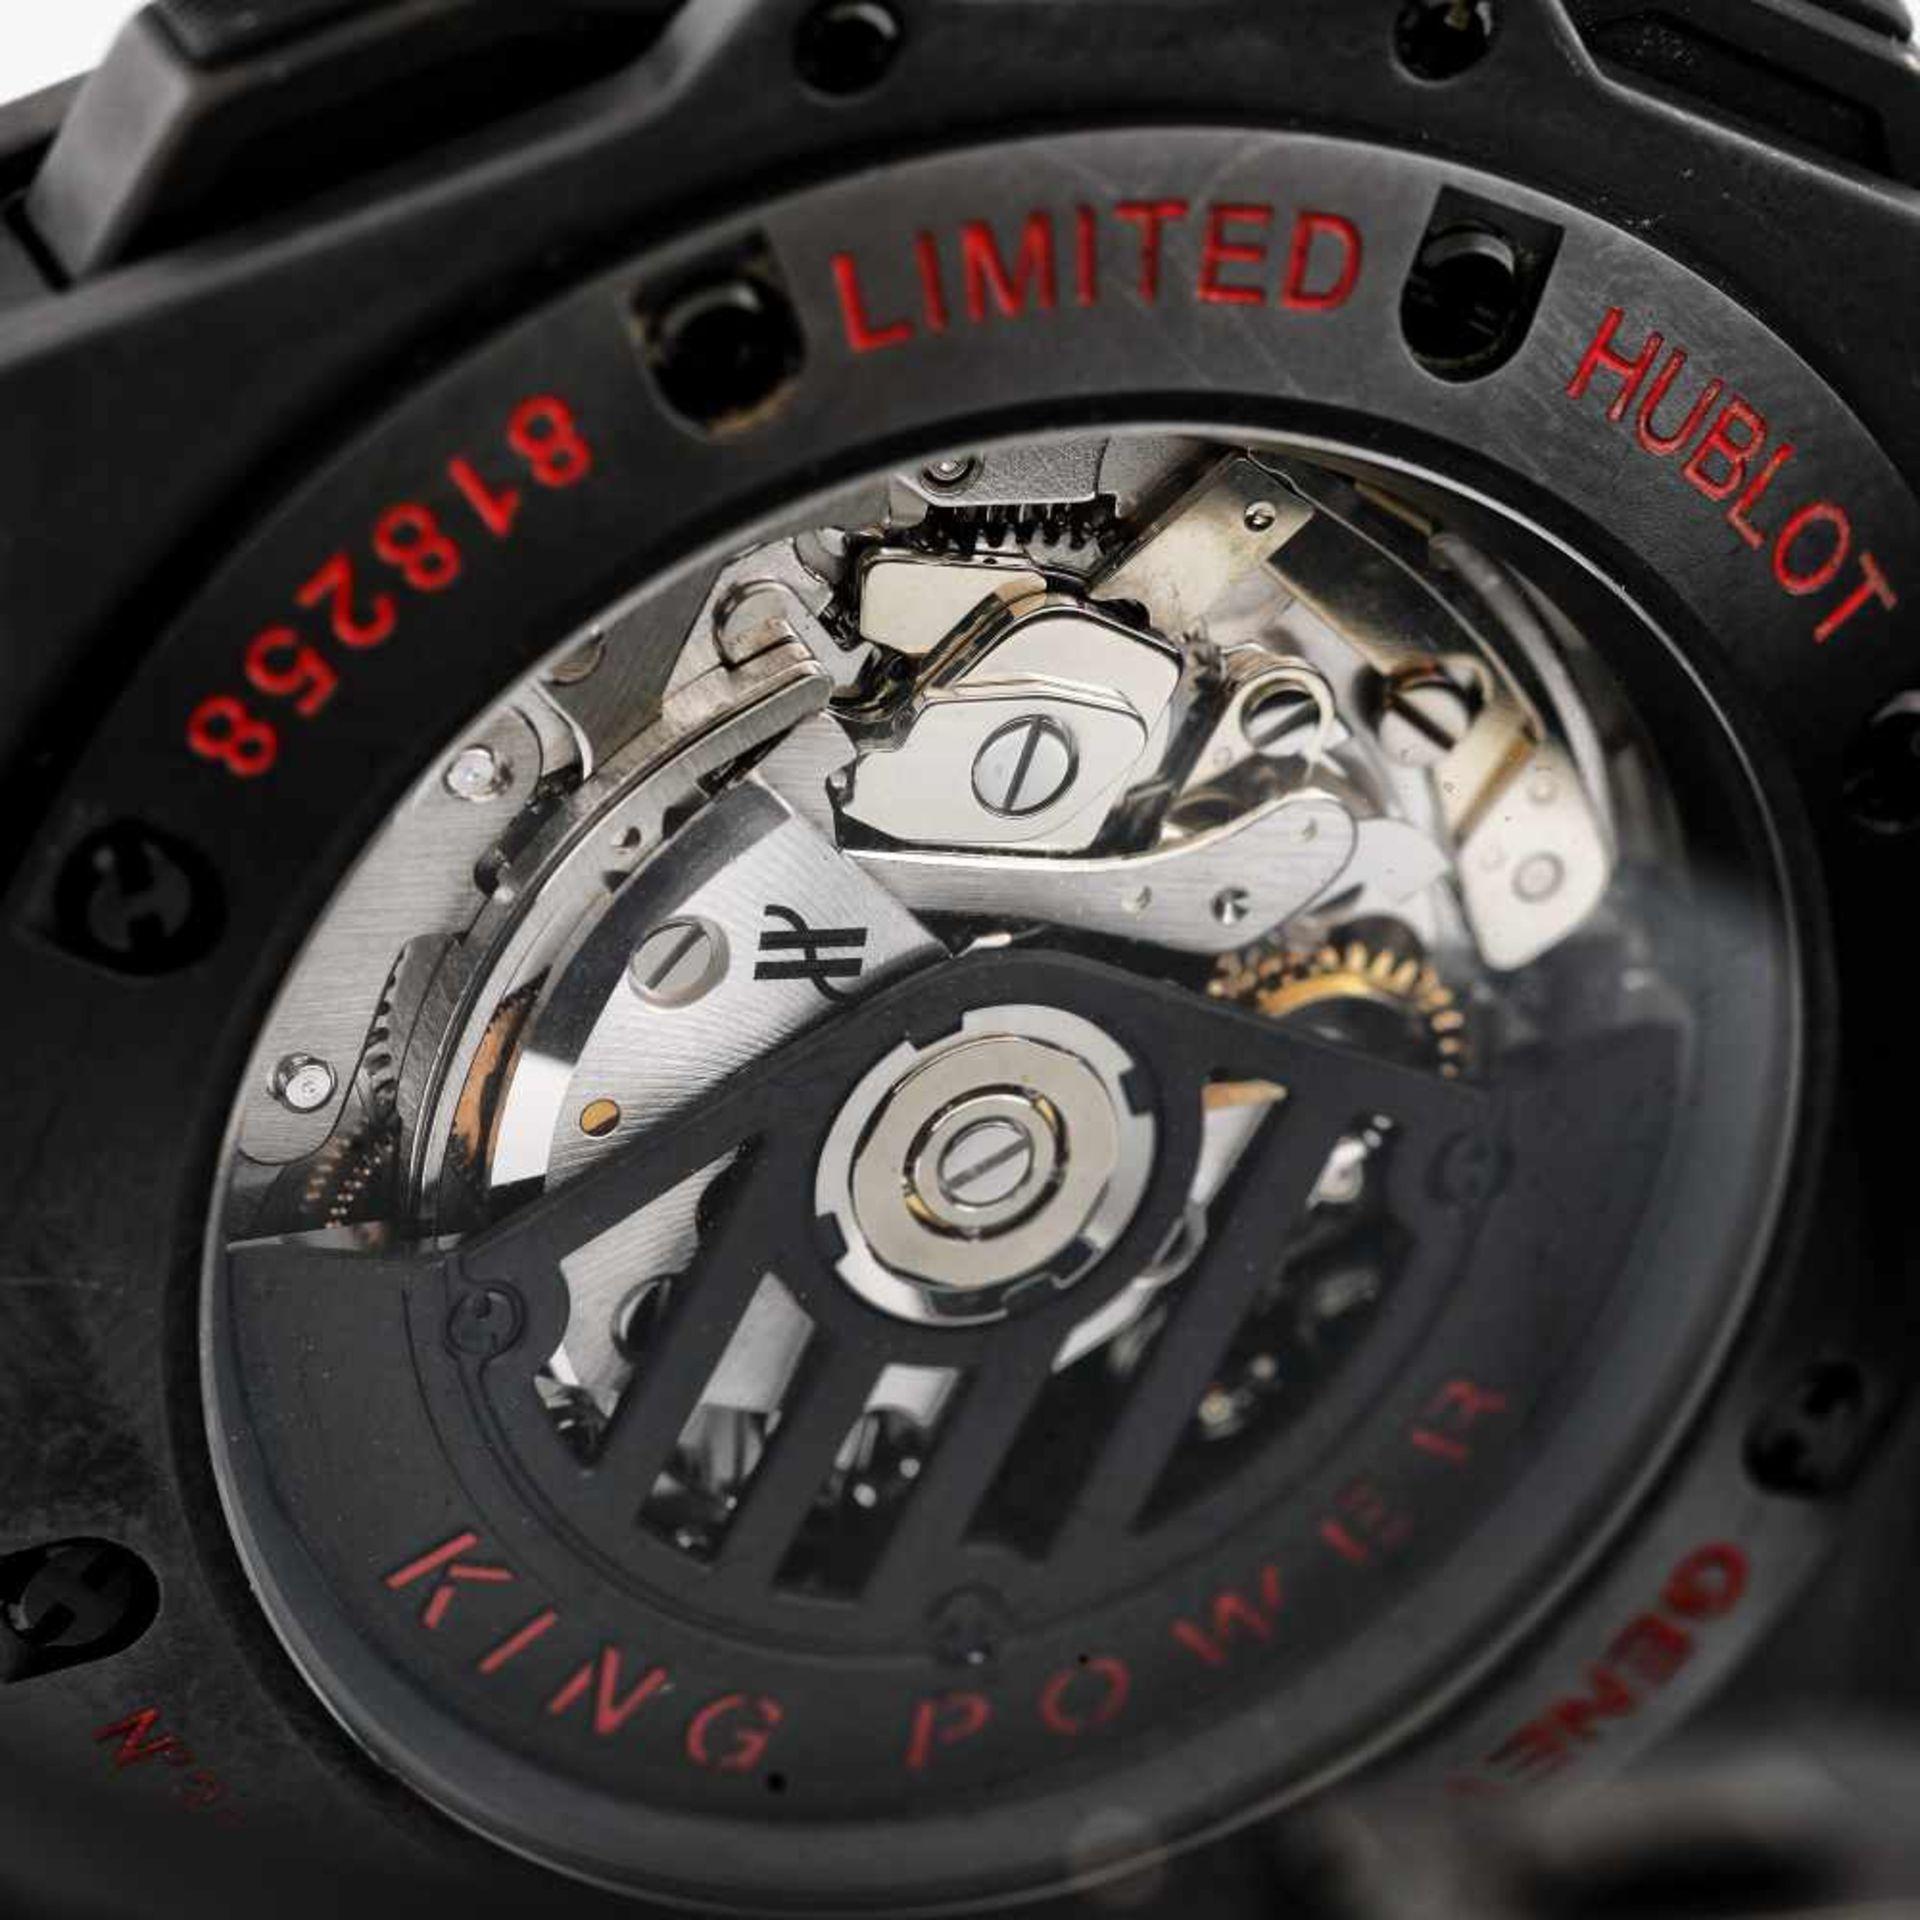 Hublot King Power wristwatch, ceramic, men, limited edition 301/500, provenance documents - Bild 4 aus 4